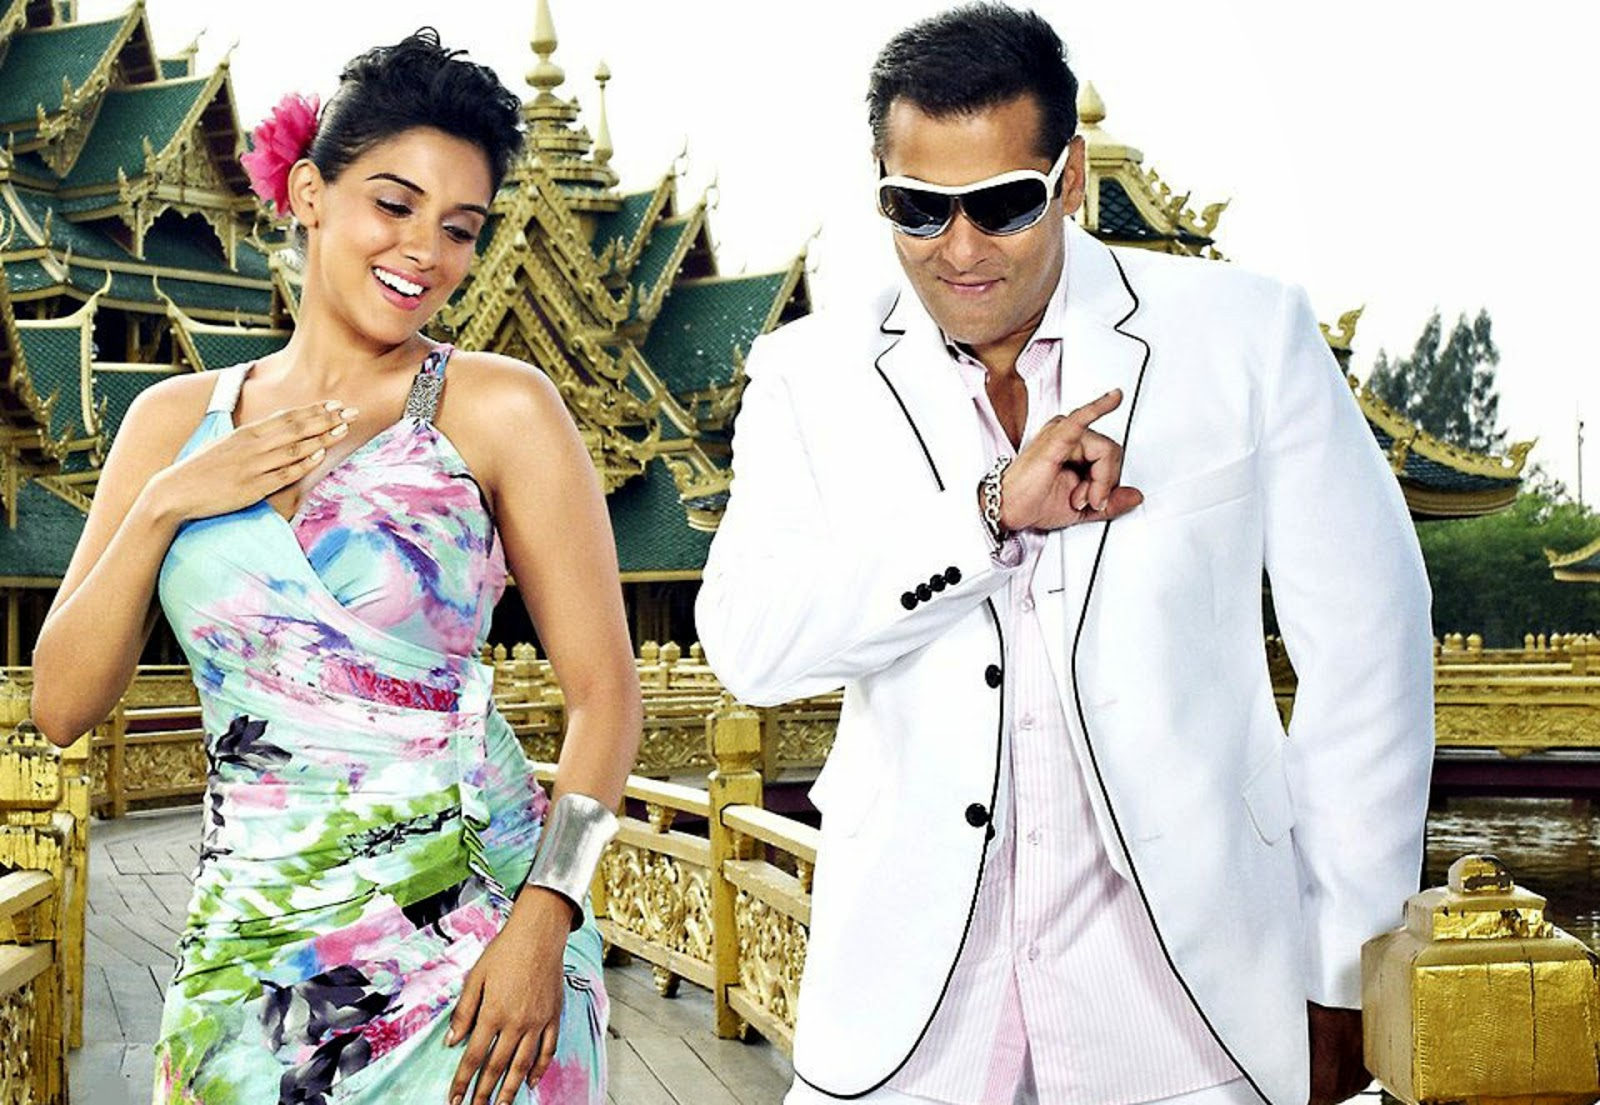 asin & salman khan wallpaper download | every couples hd wallpapers